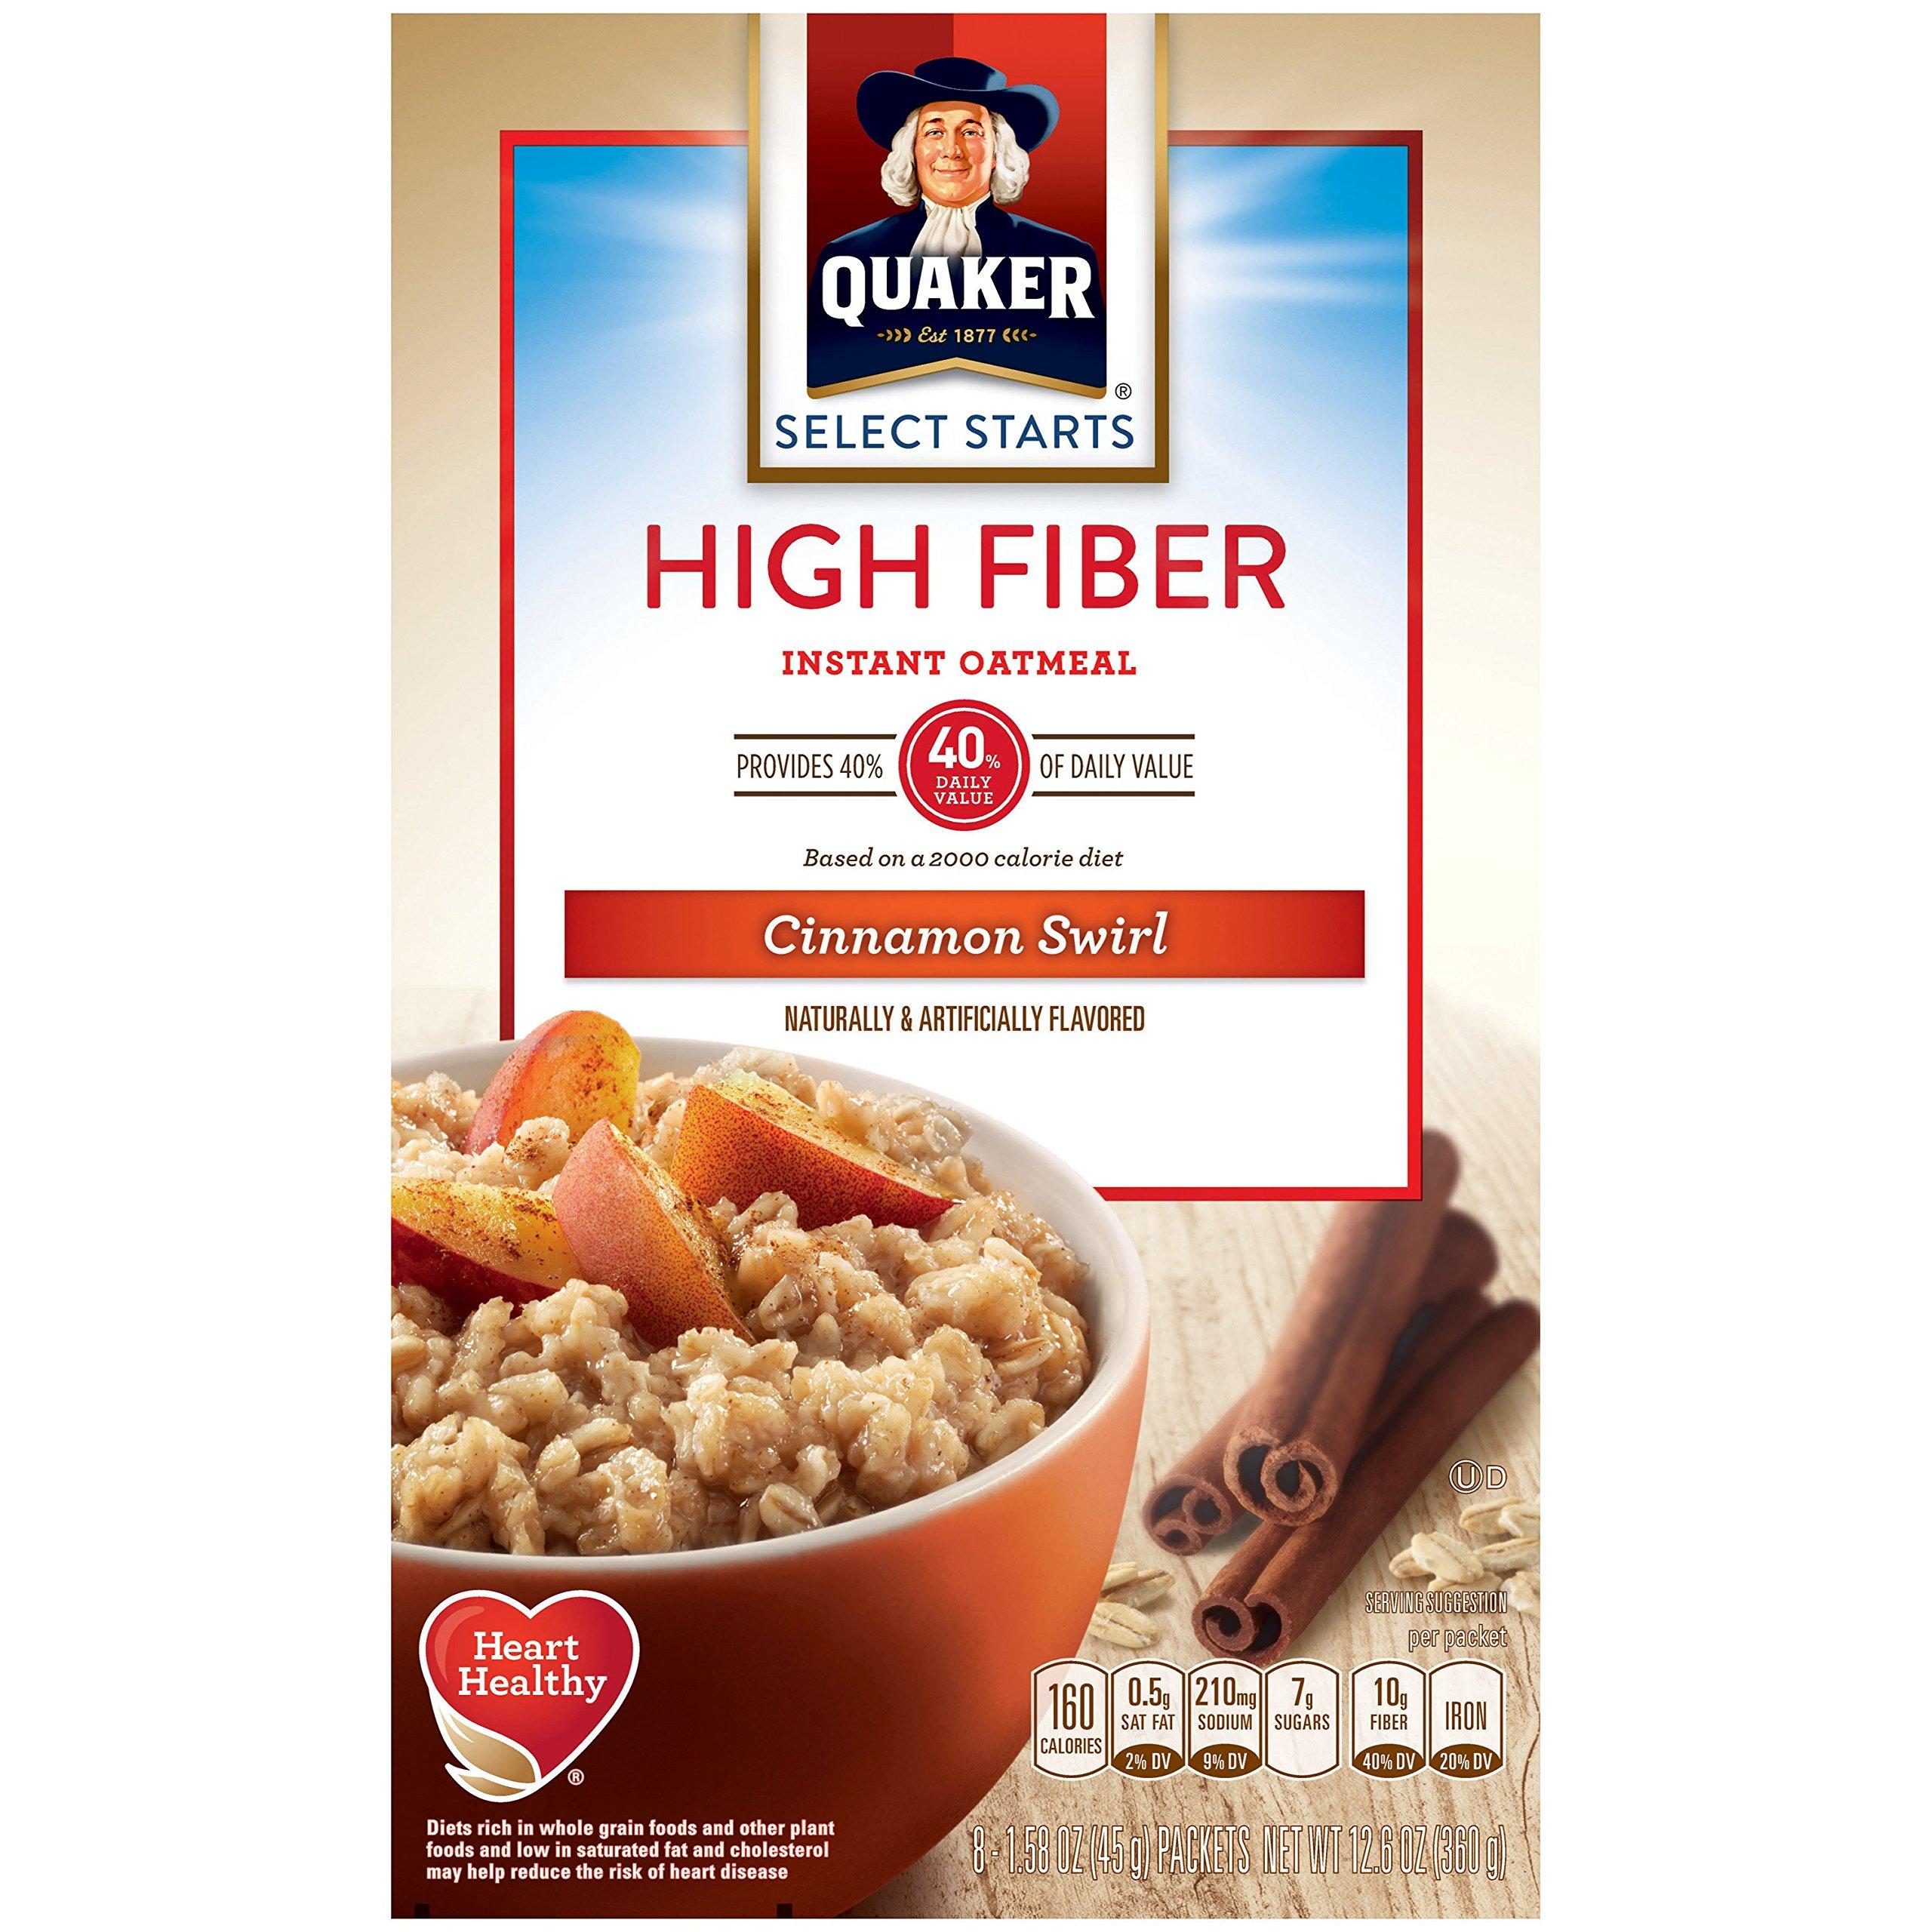 Quaker Instant Oatmeal High Fiber Cinnamon Swirl Breakfast